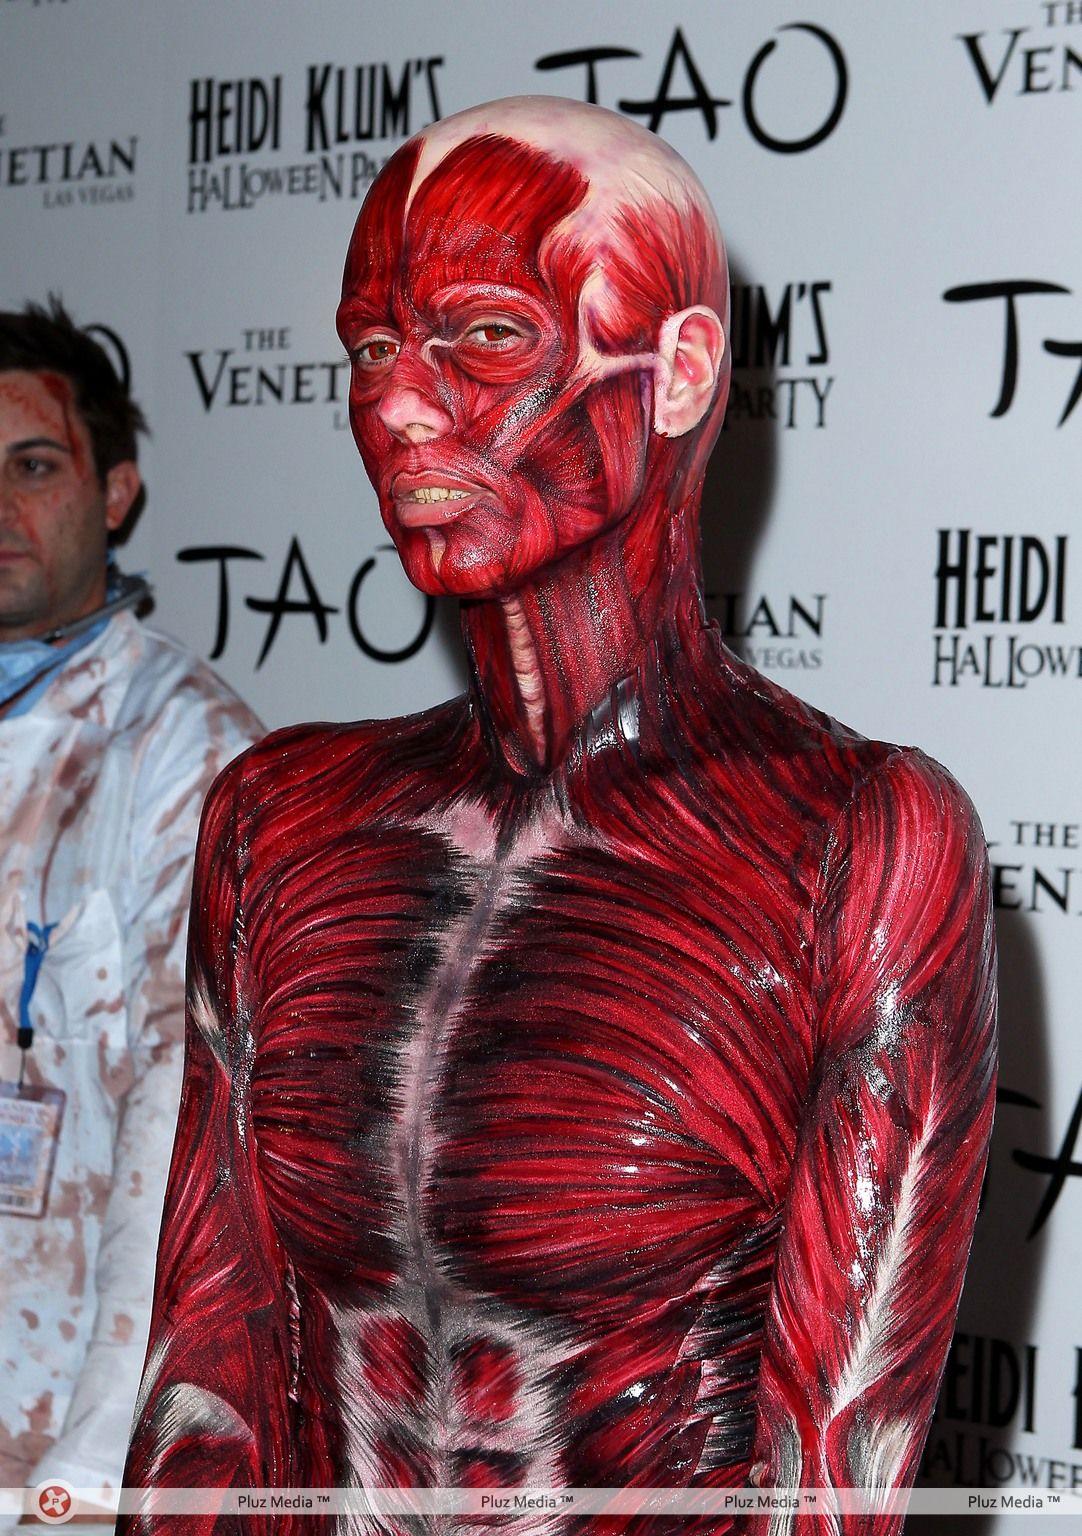 Heidi Klum's 12th Annual Halloween Party Presented By Tao Nightclub